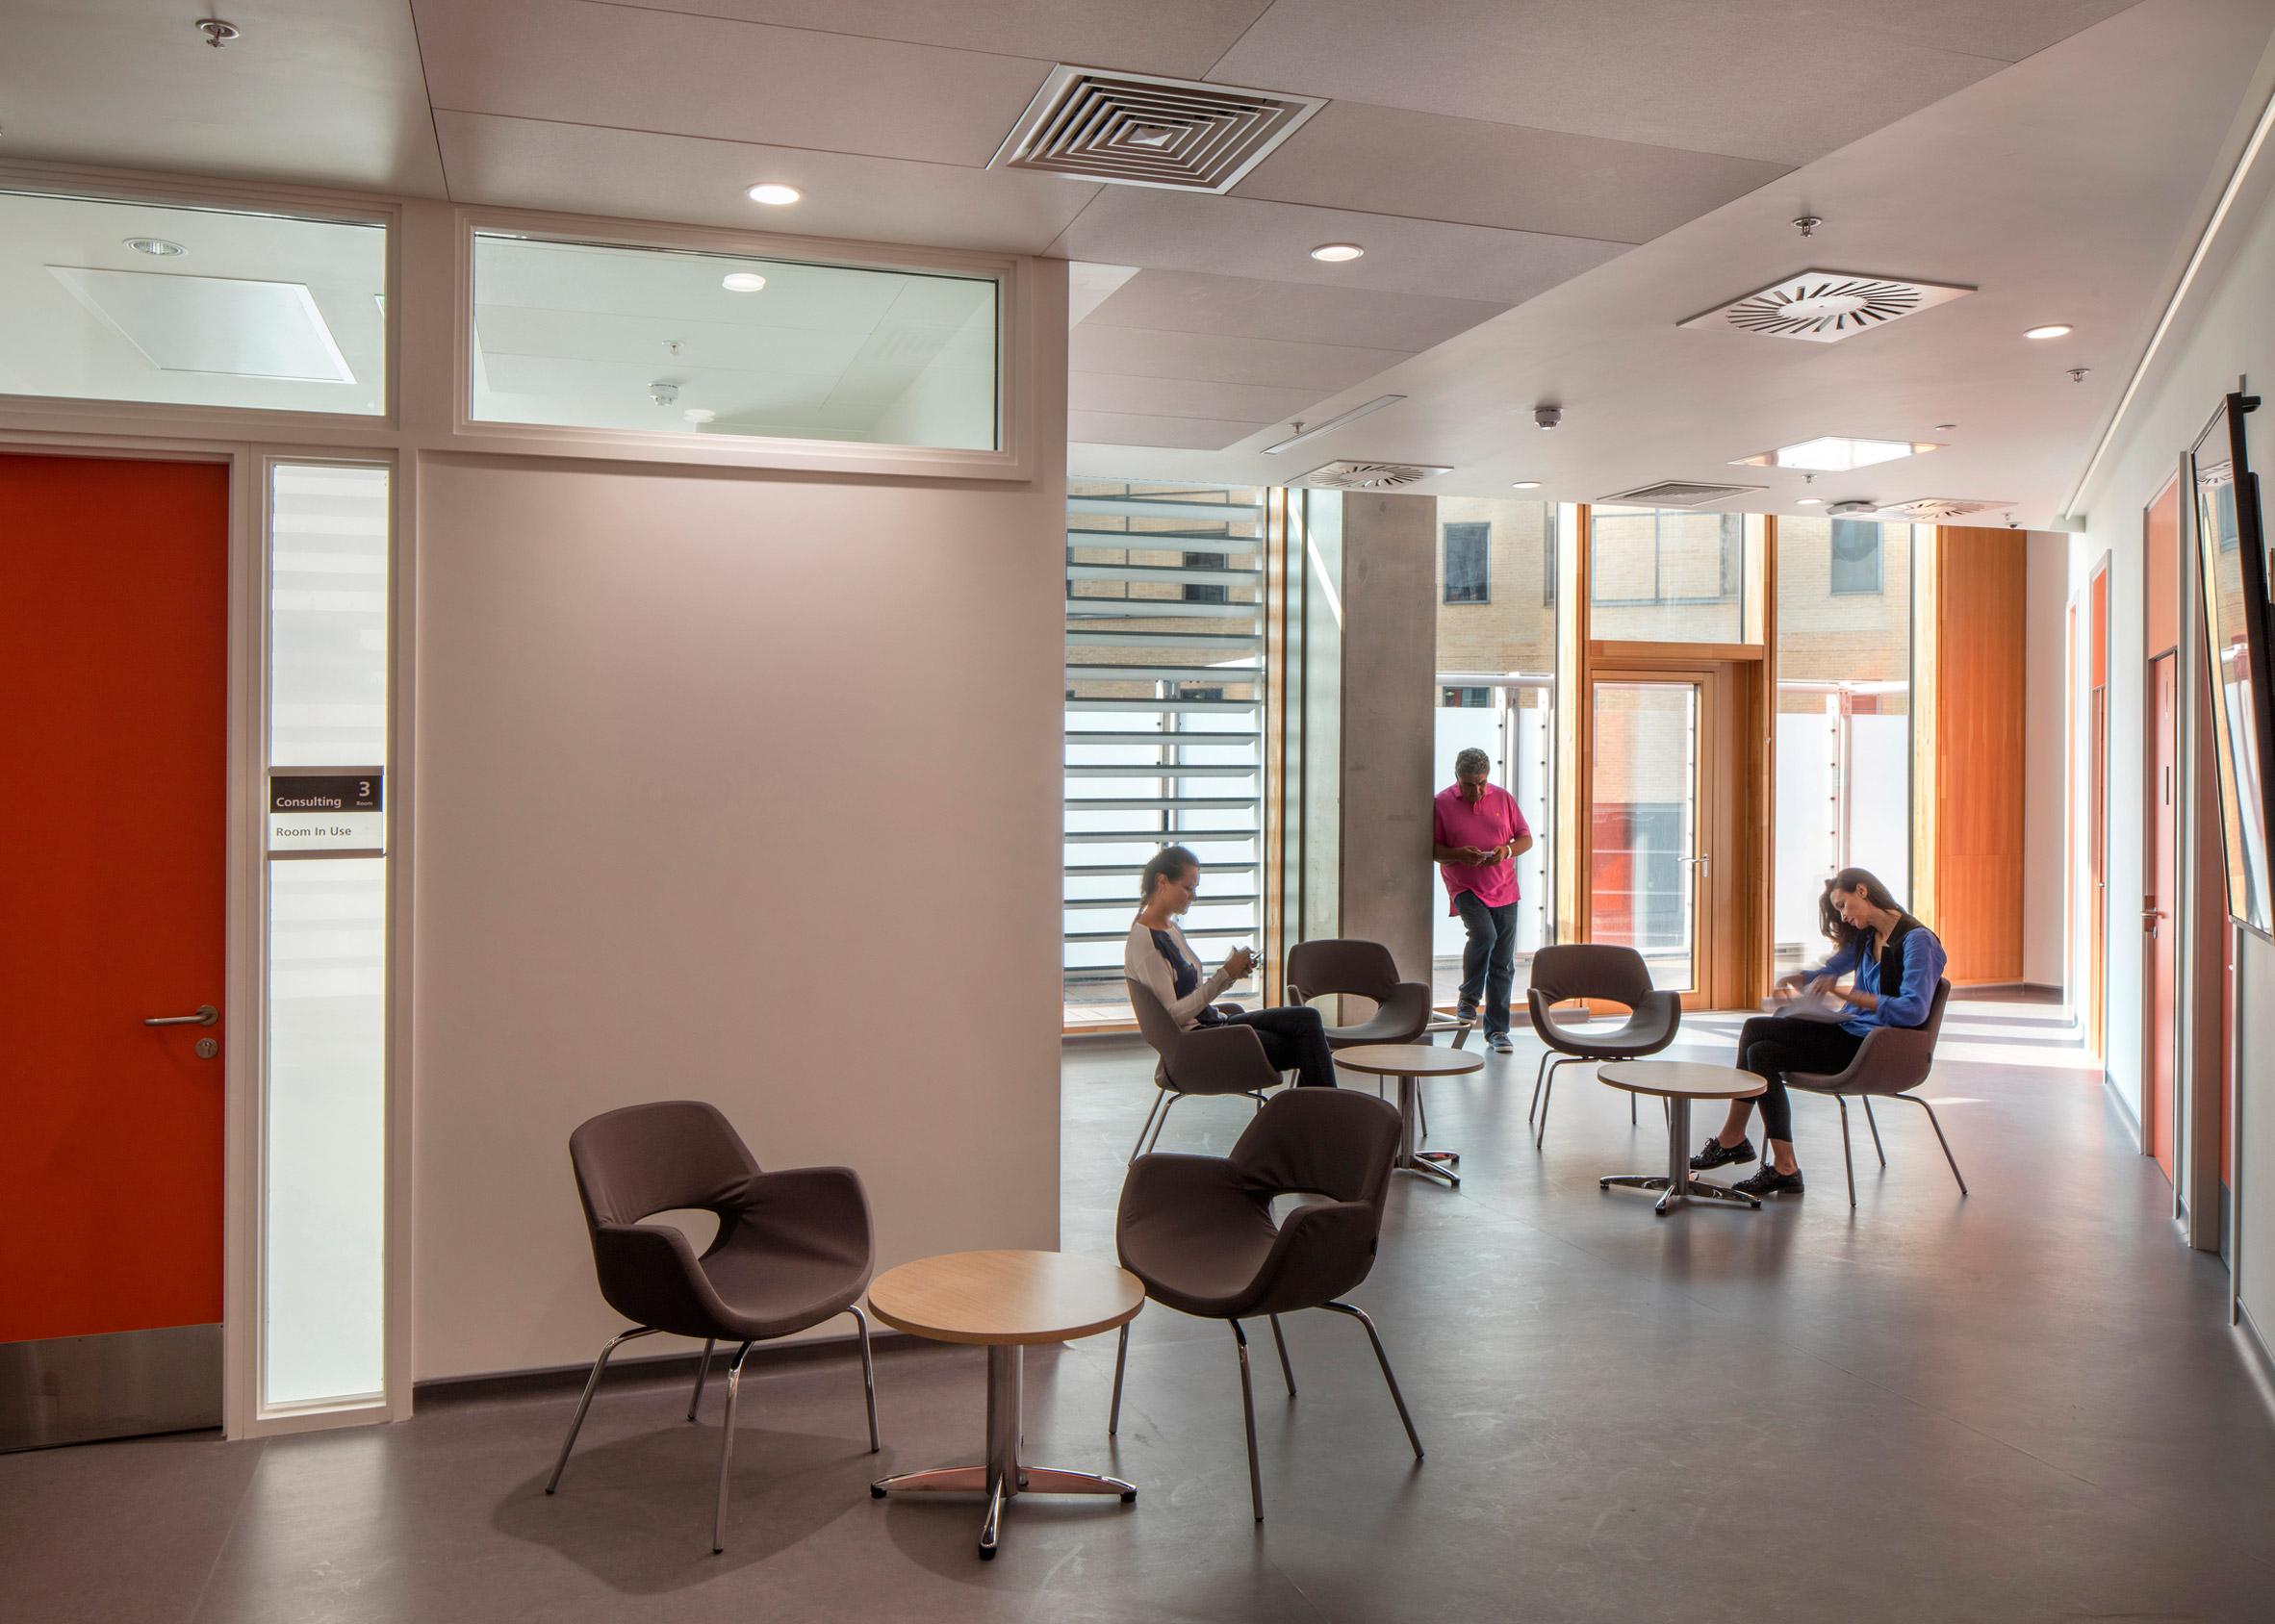 Rogers Stirk Harbour's £160 million cancer treatment centre opens at London hospital